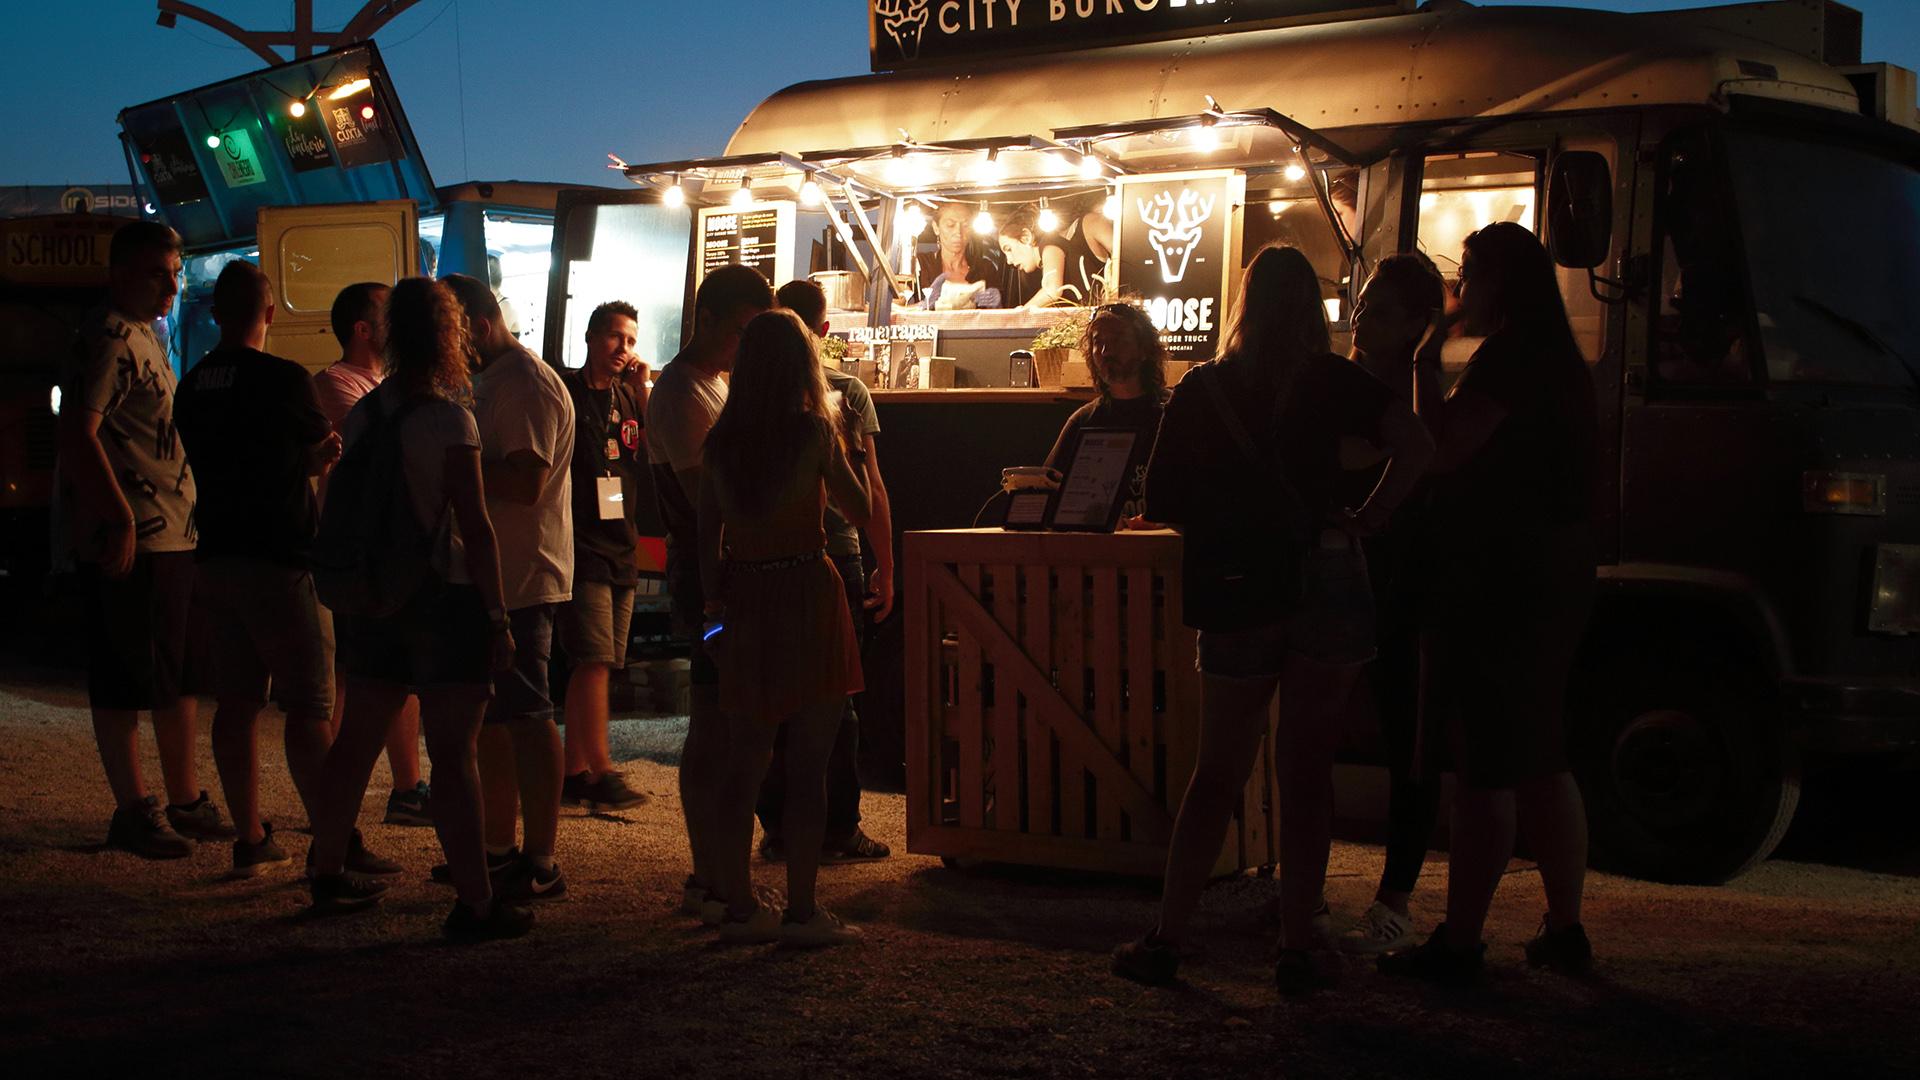 food truck unsplash alvaro reyes